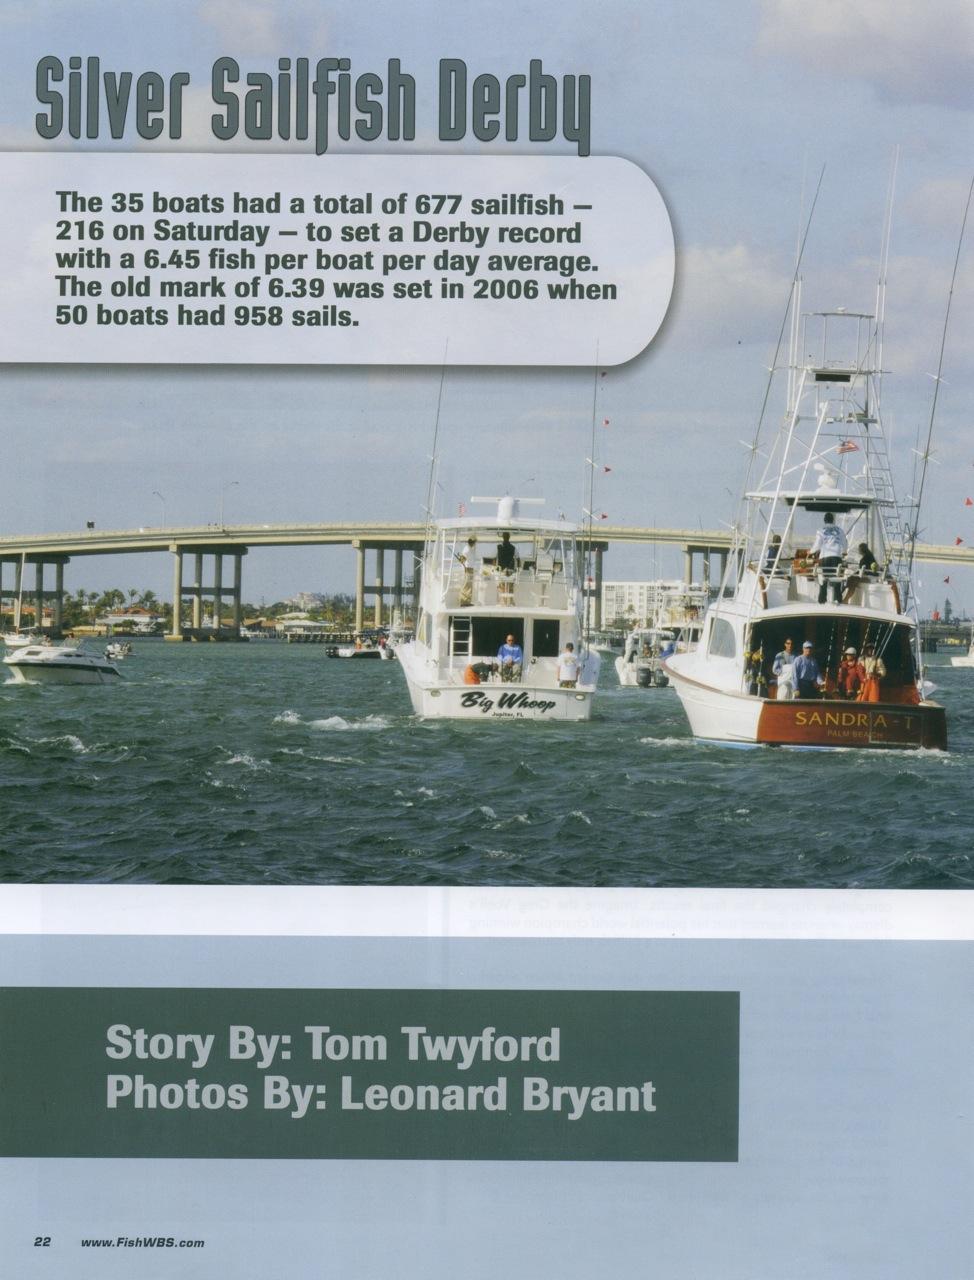 Silver Sailfish Get Lit wins 2011